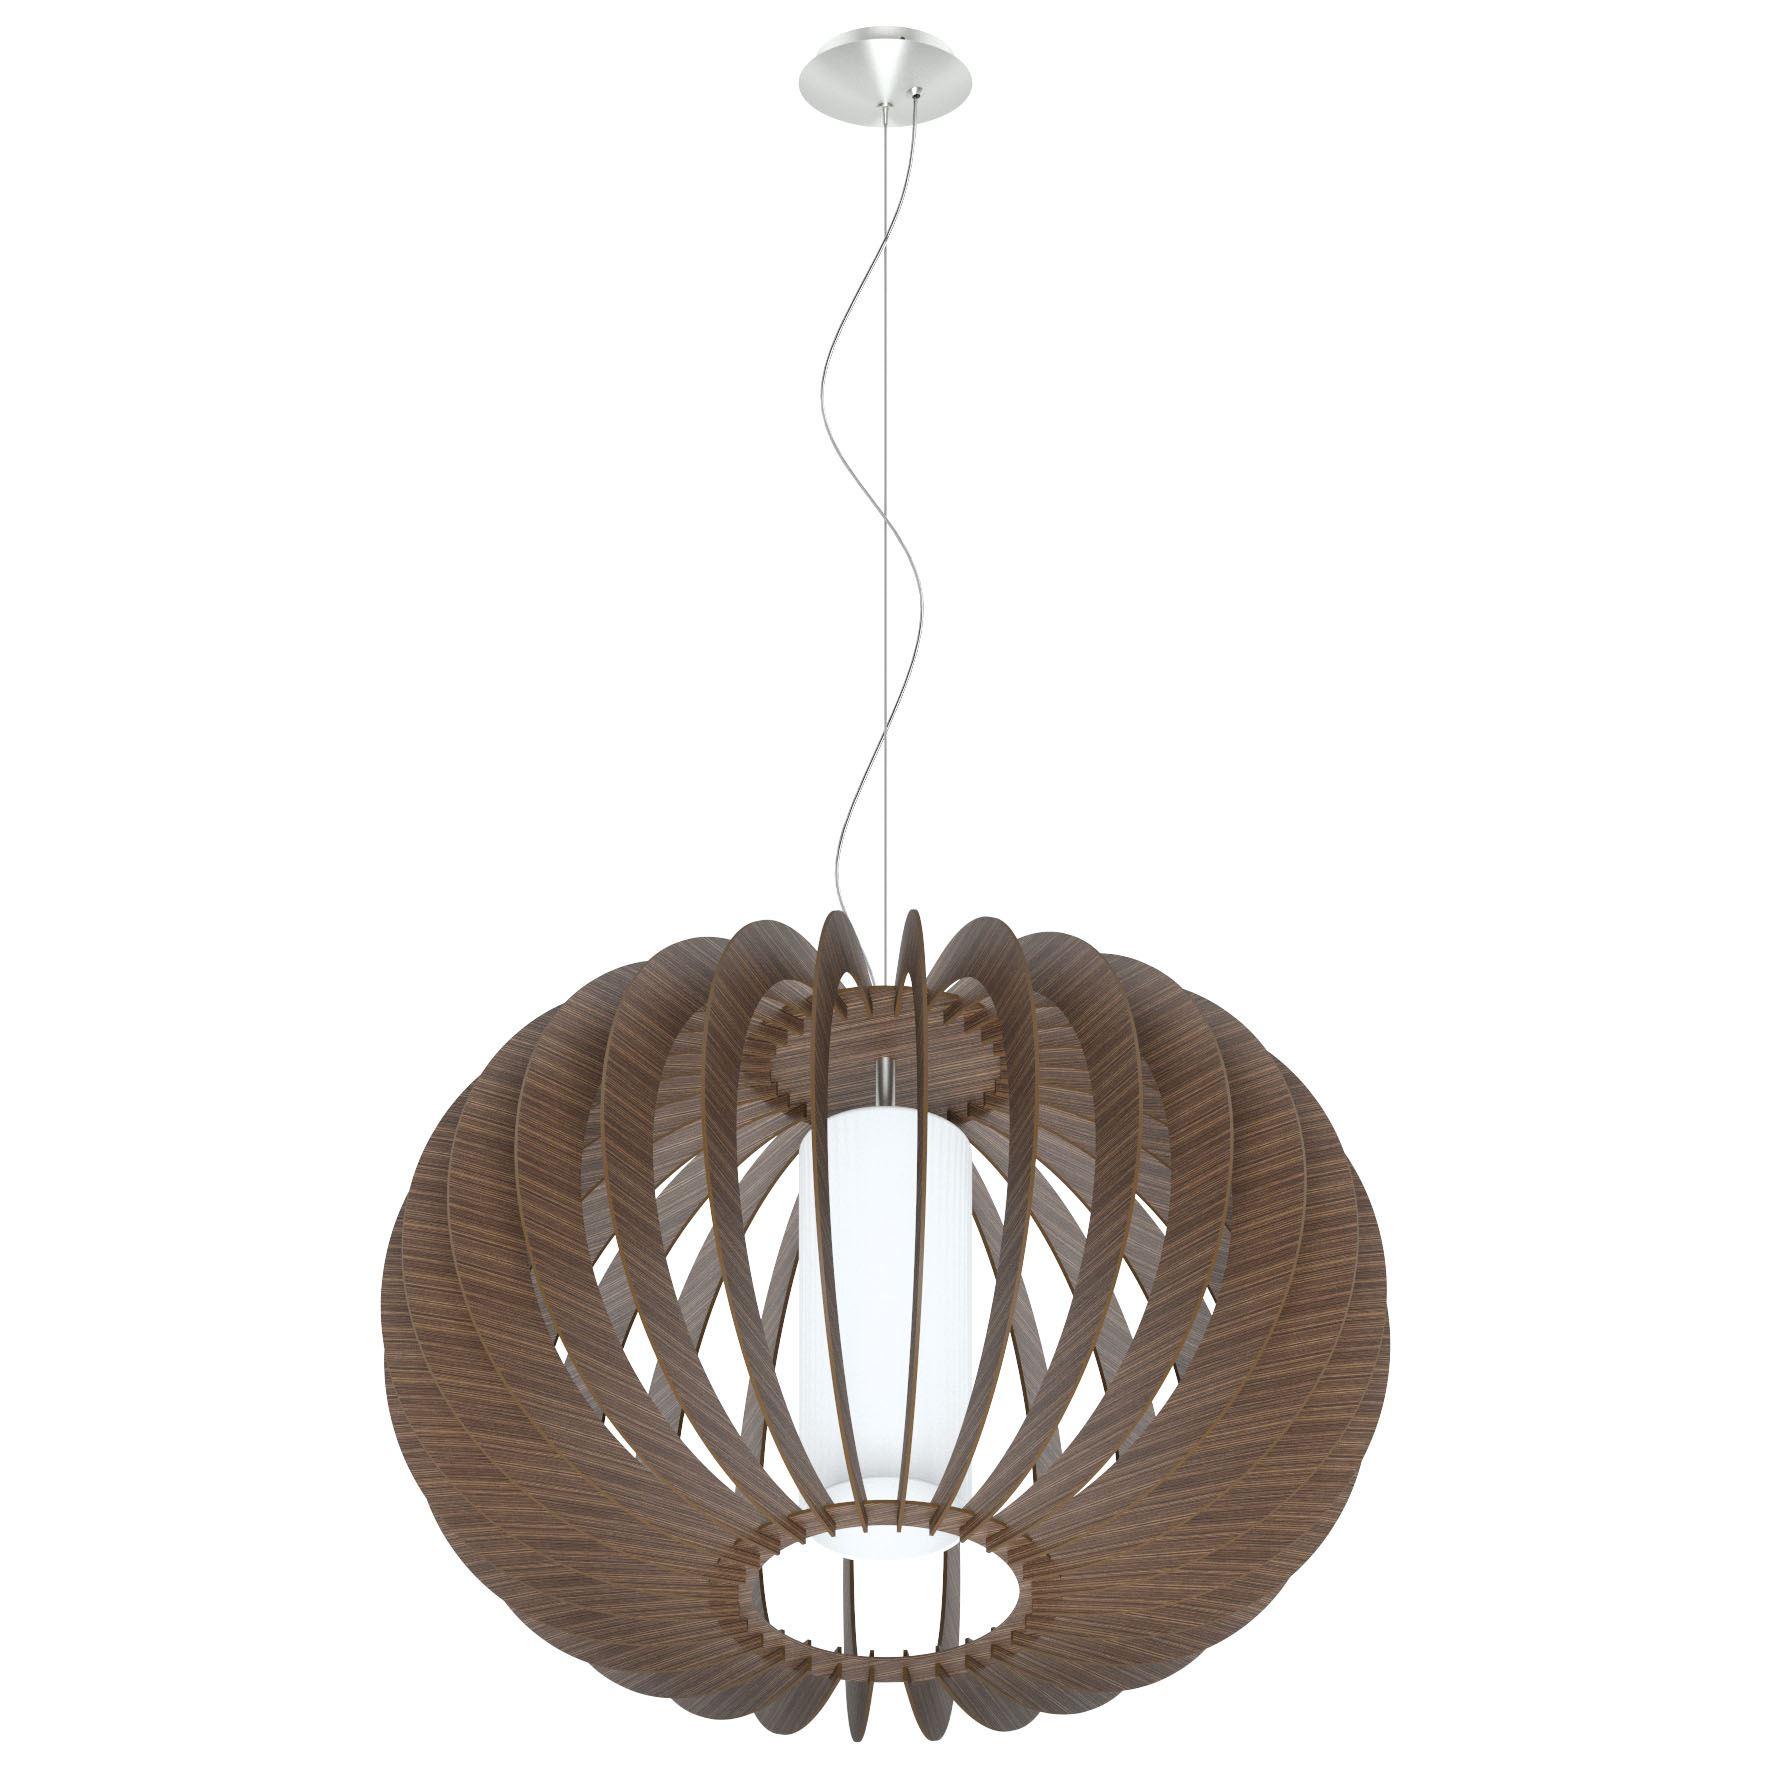 Stellato Steel Hanging Light Dia 700mm Wood Brown Glass White Shade